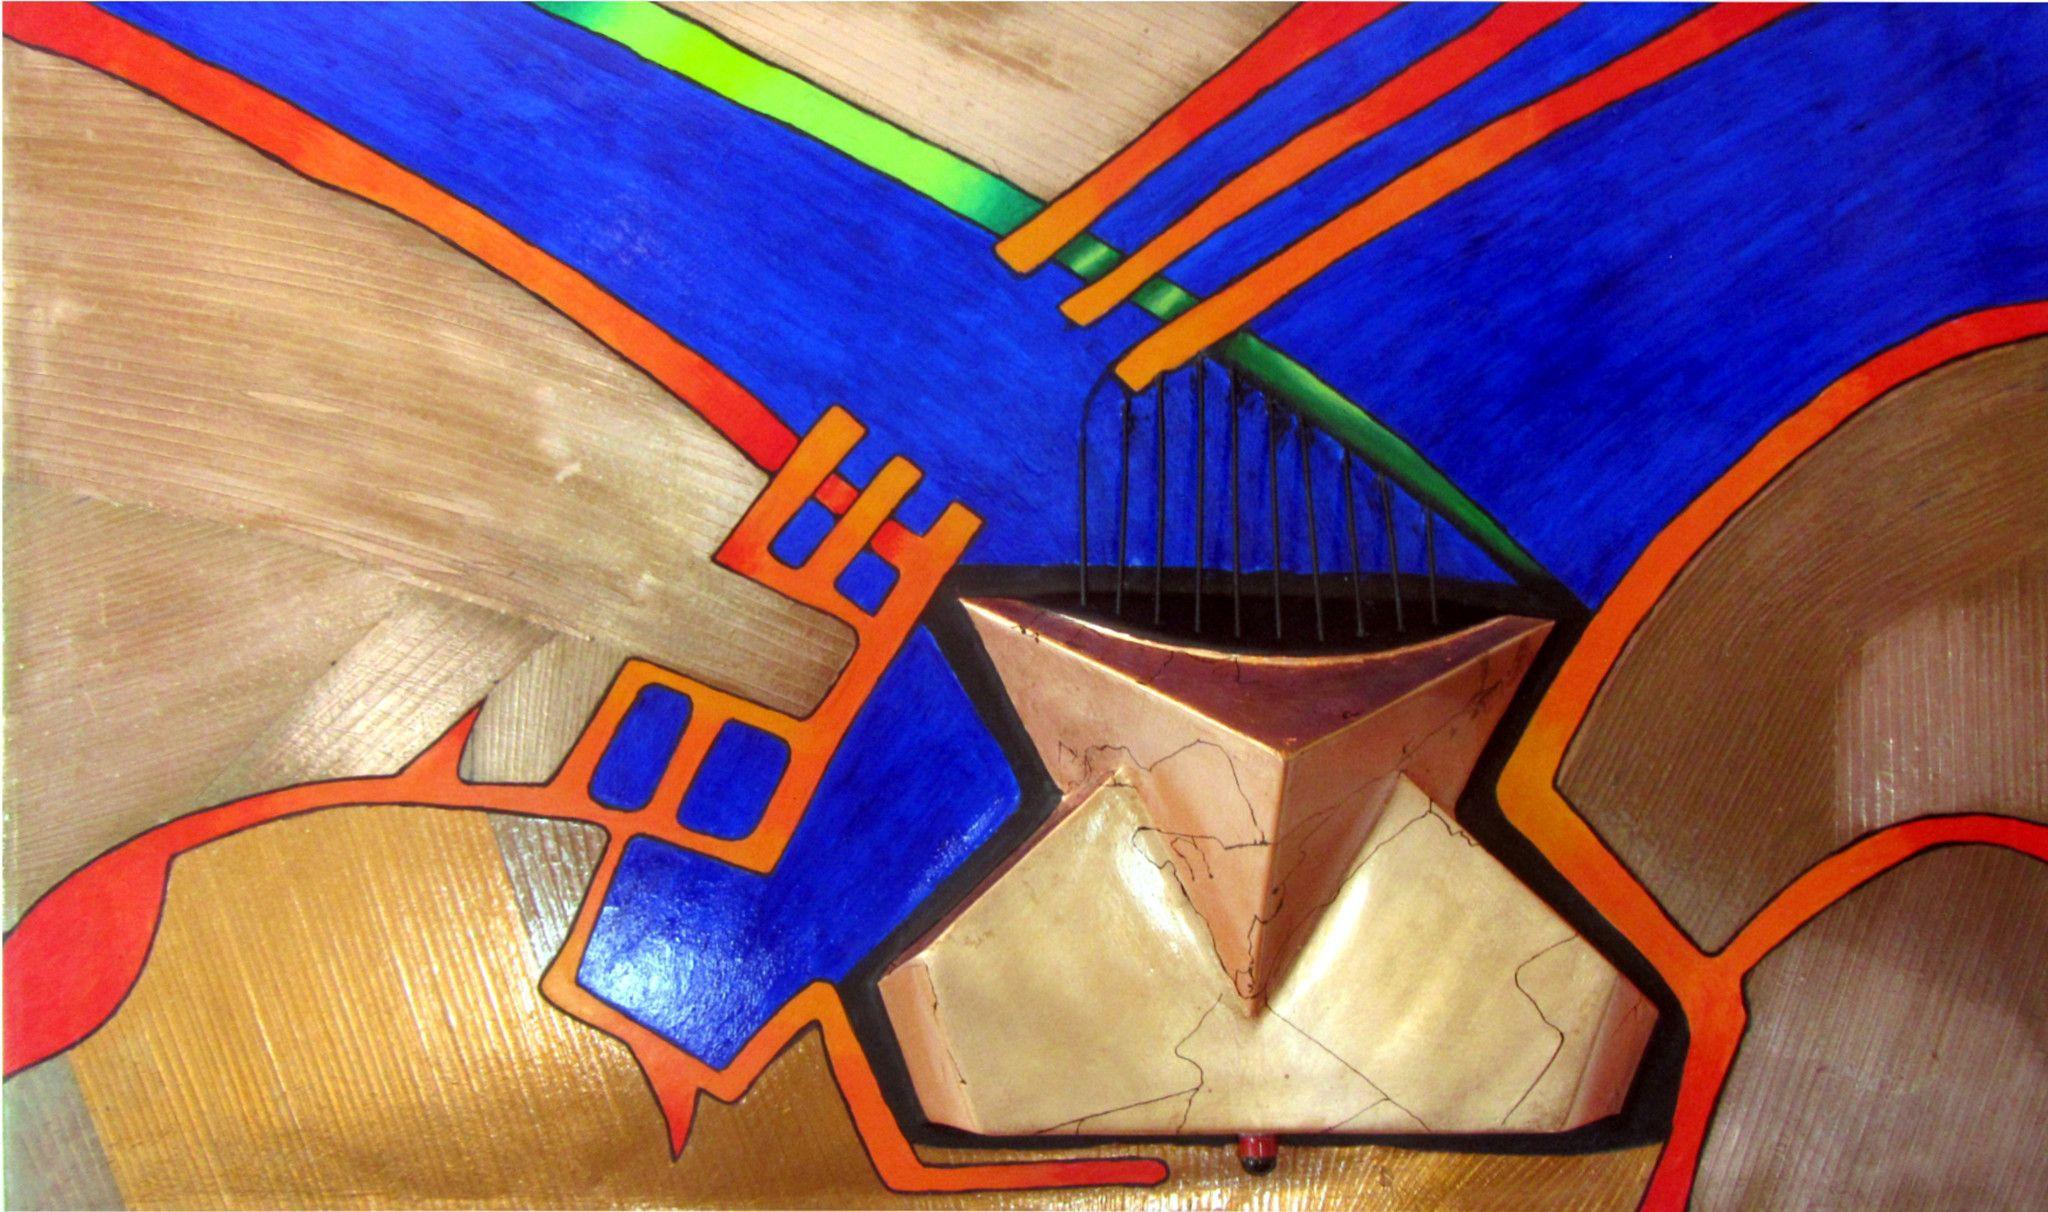 MIXED MEDIA ON WOODEN BOARD  MARIO VERDIANI ' DECO # 2 '  size L 100 x H 60 cm.